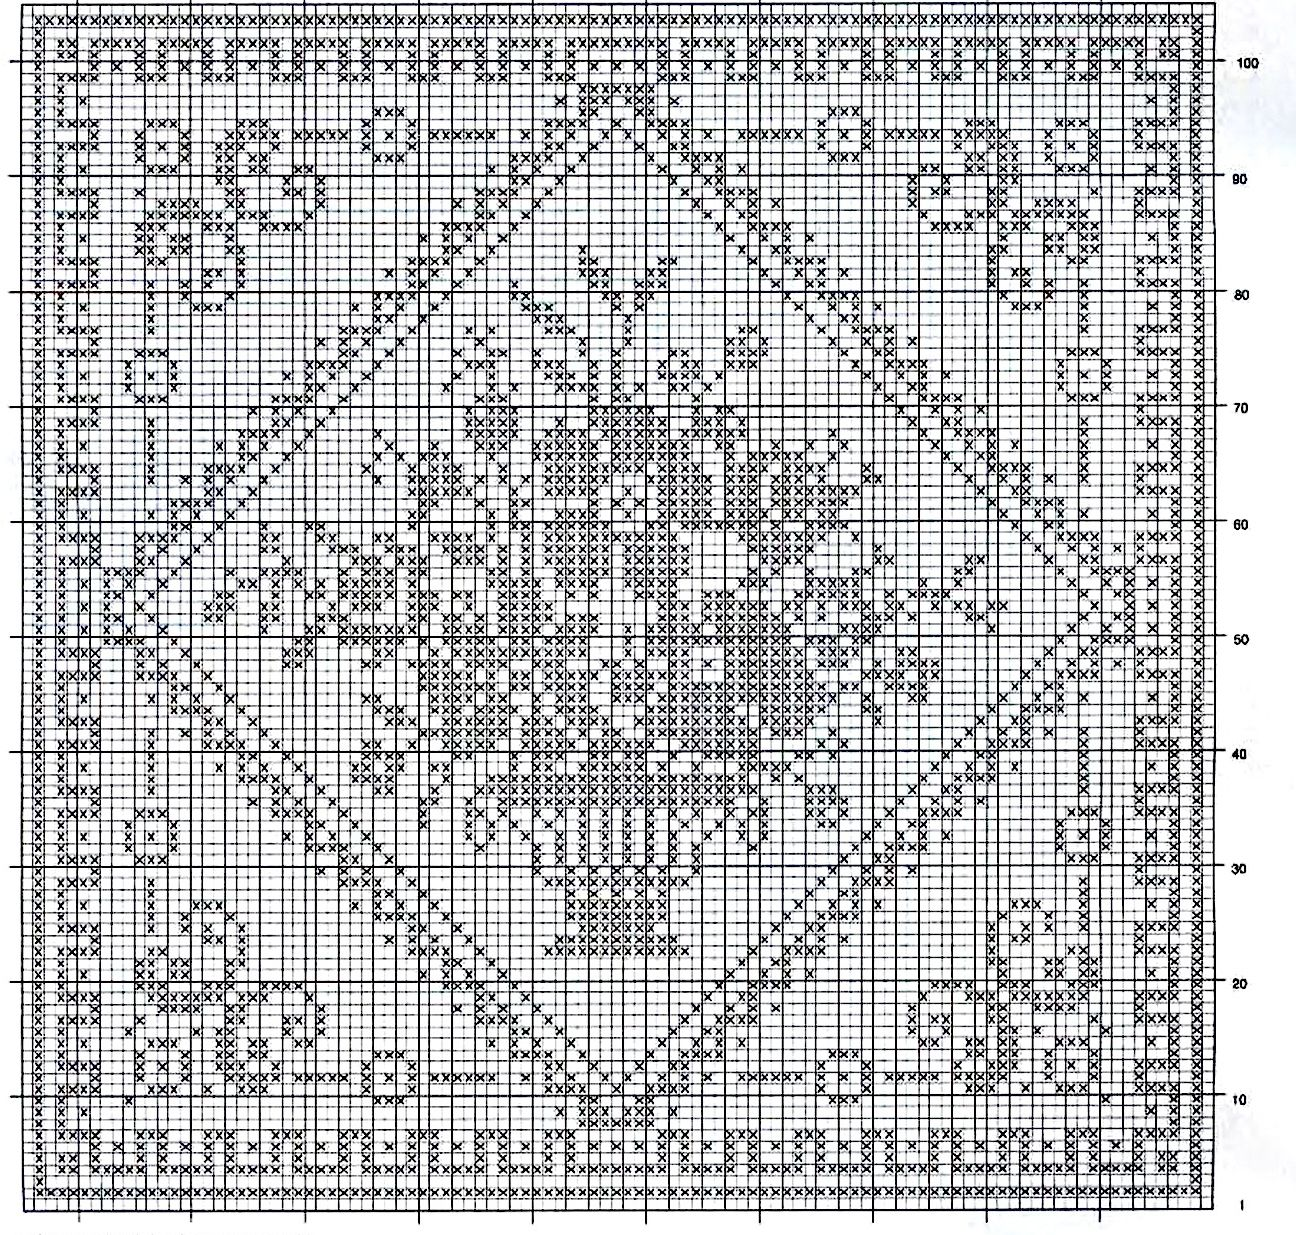 free crochet square pattern diagram 1996 honda civic ex power window wiring doily  patterns